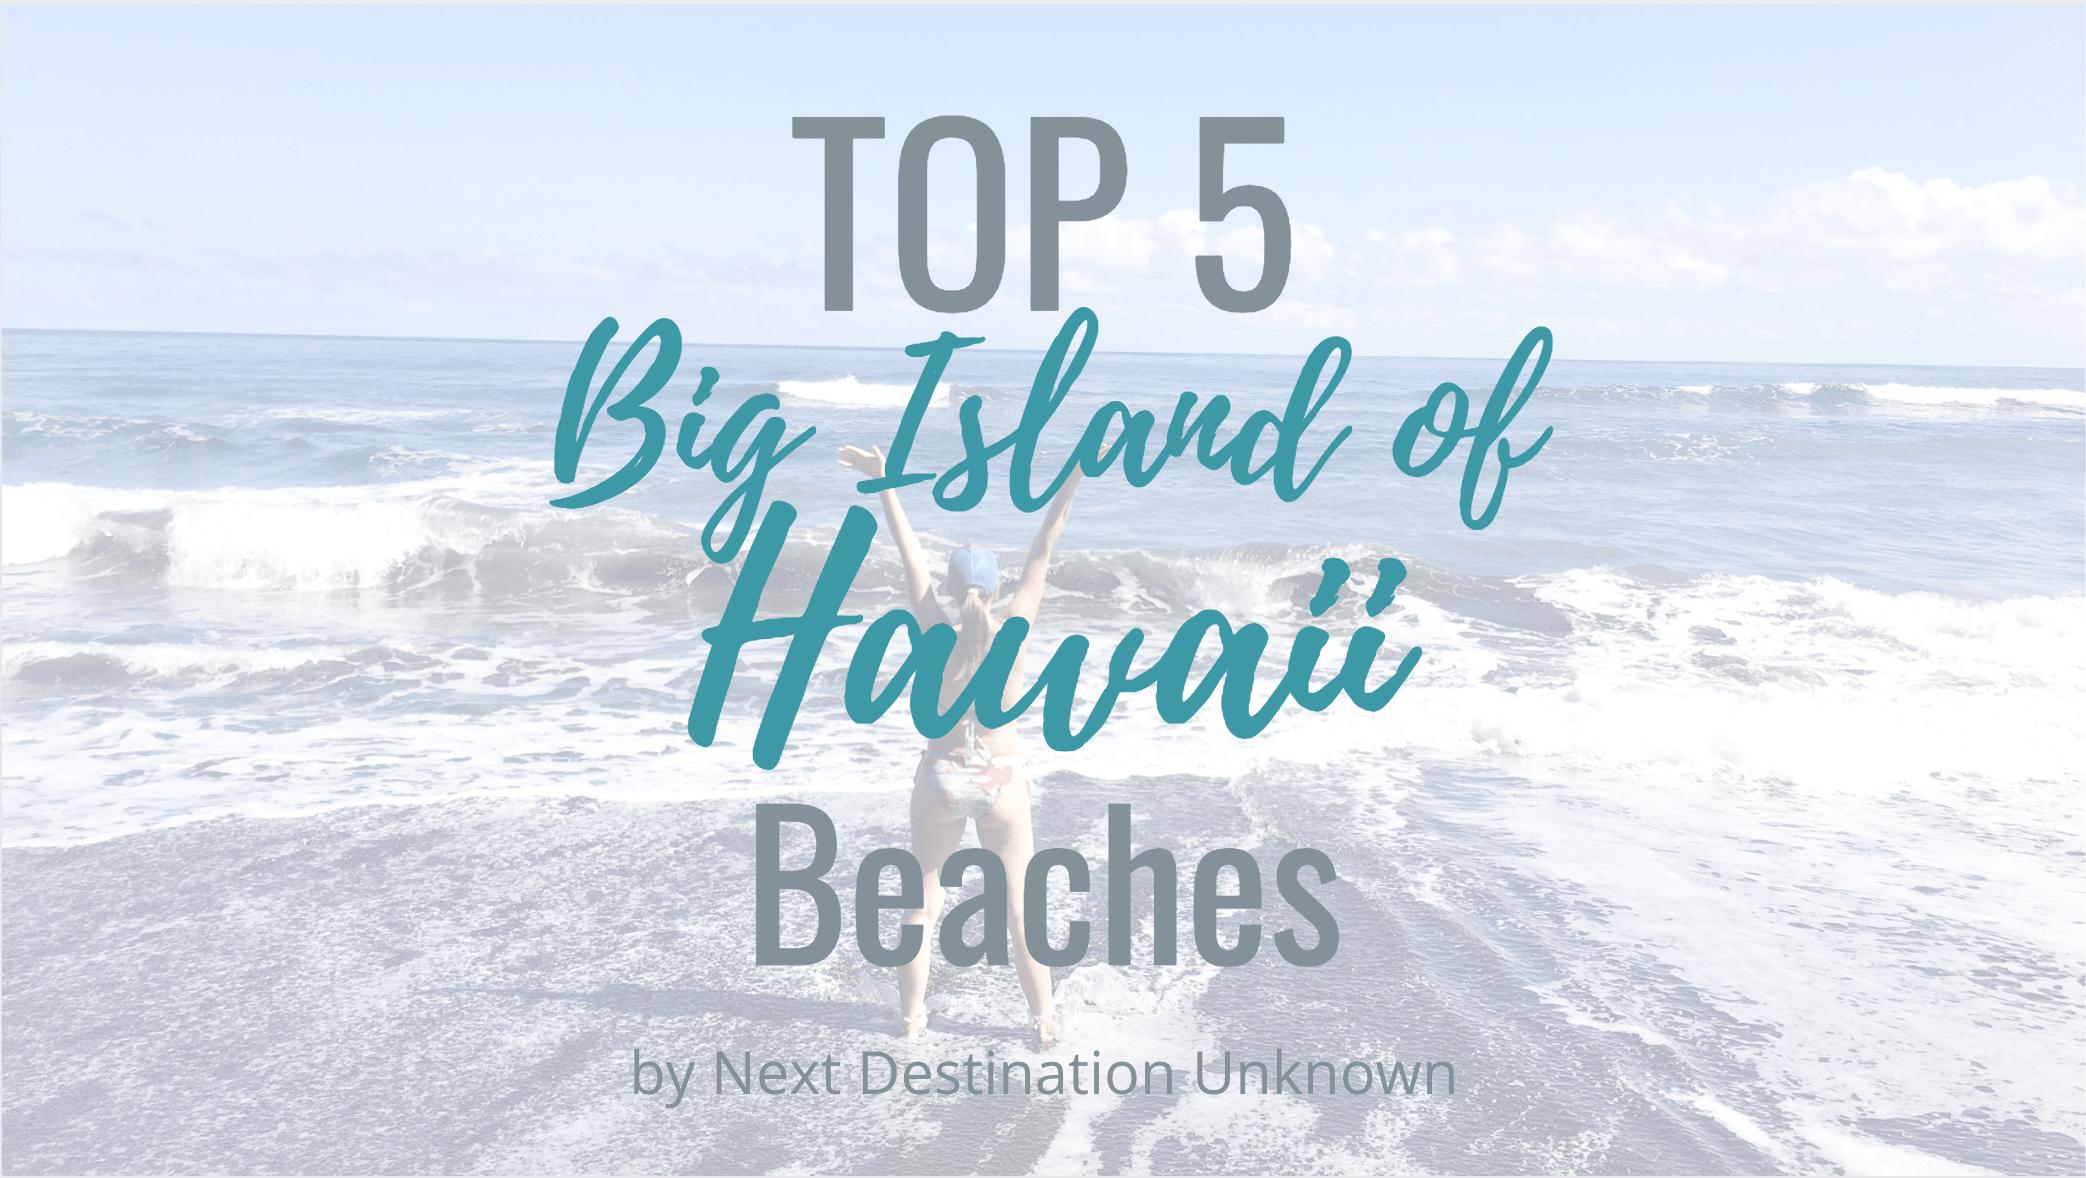 Top 5 Beaches on the Big Island of Hawaii